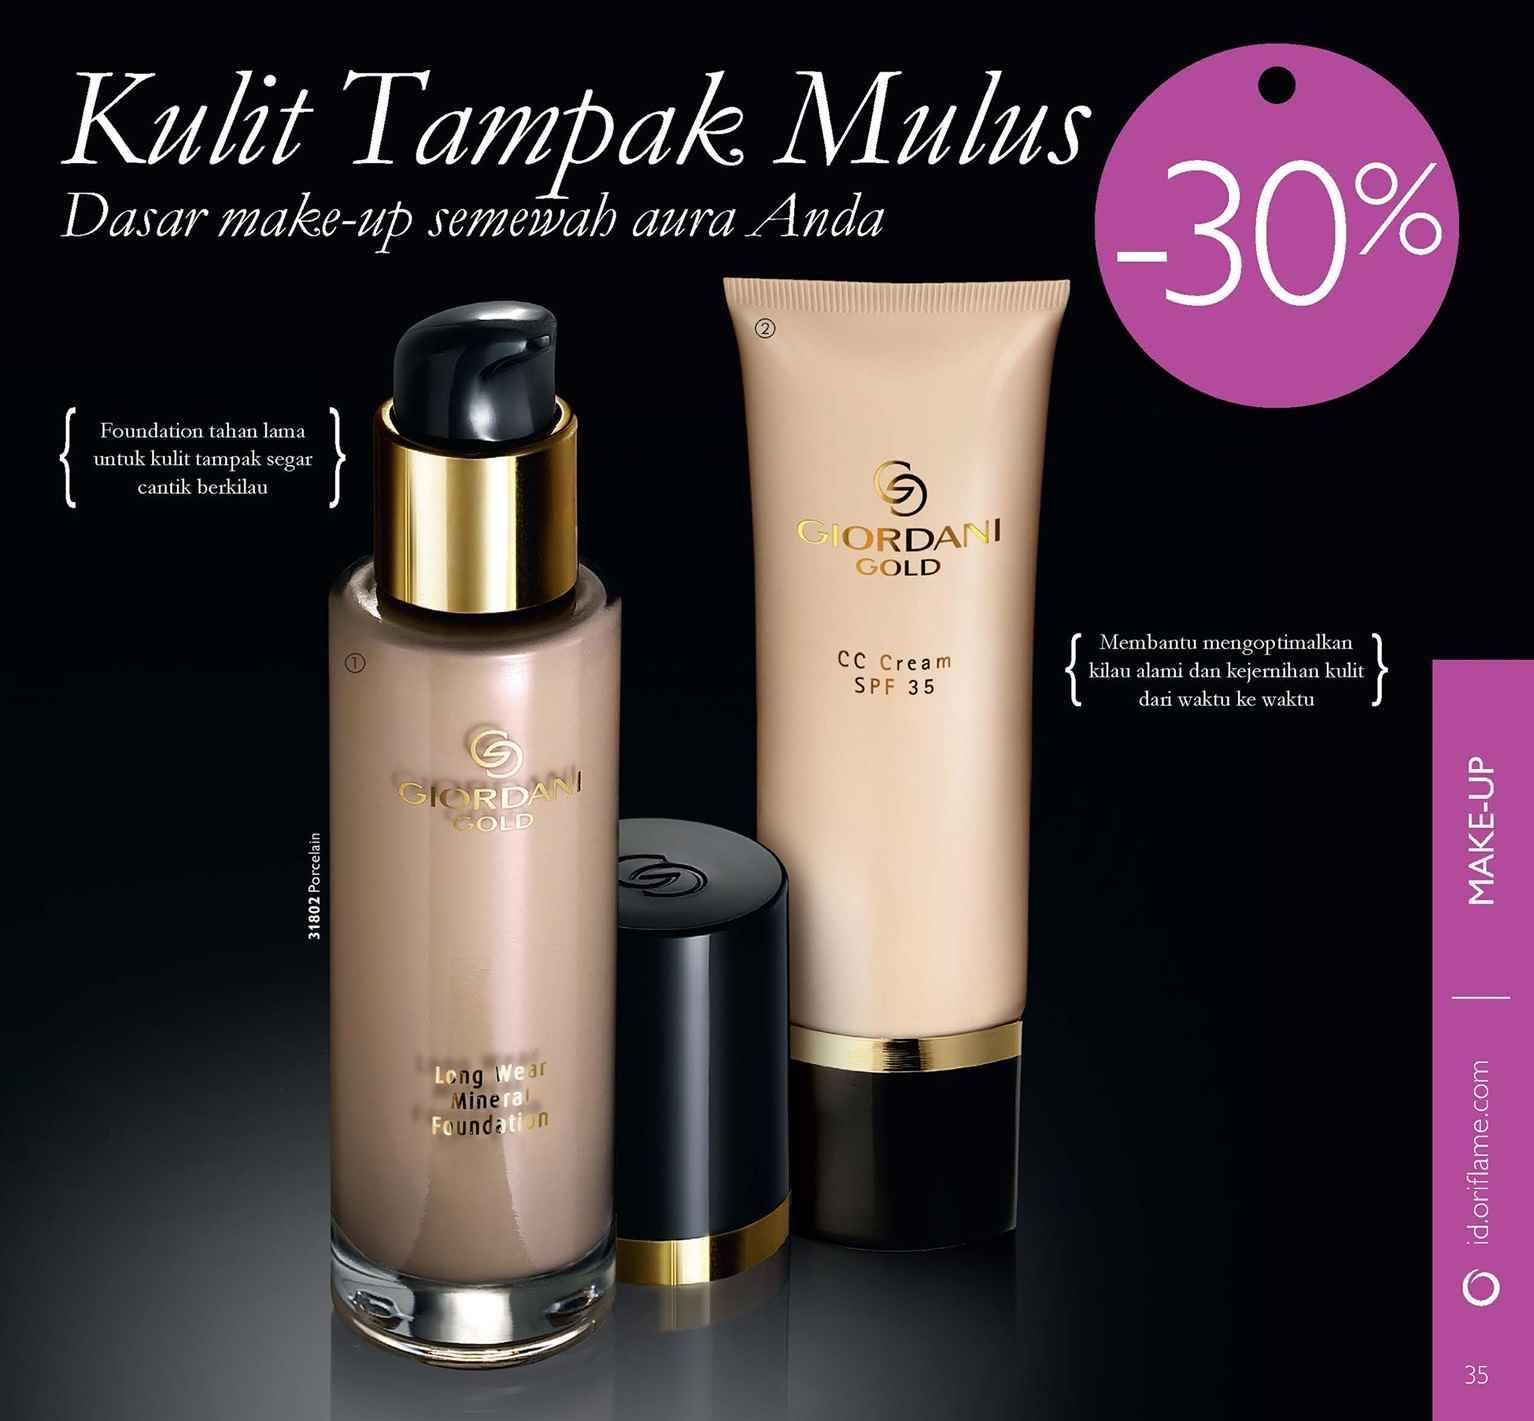 Katalog Oriflame Cosmetics Oriflamebeauty Pinterest Giordani Gold Cc Cream Spf 35